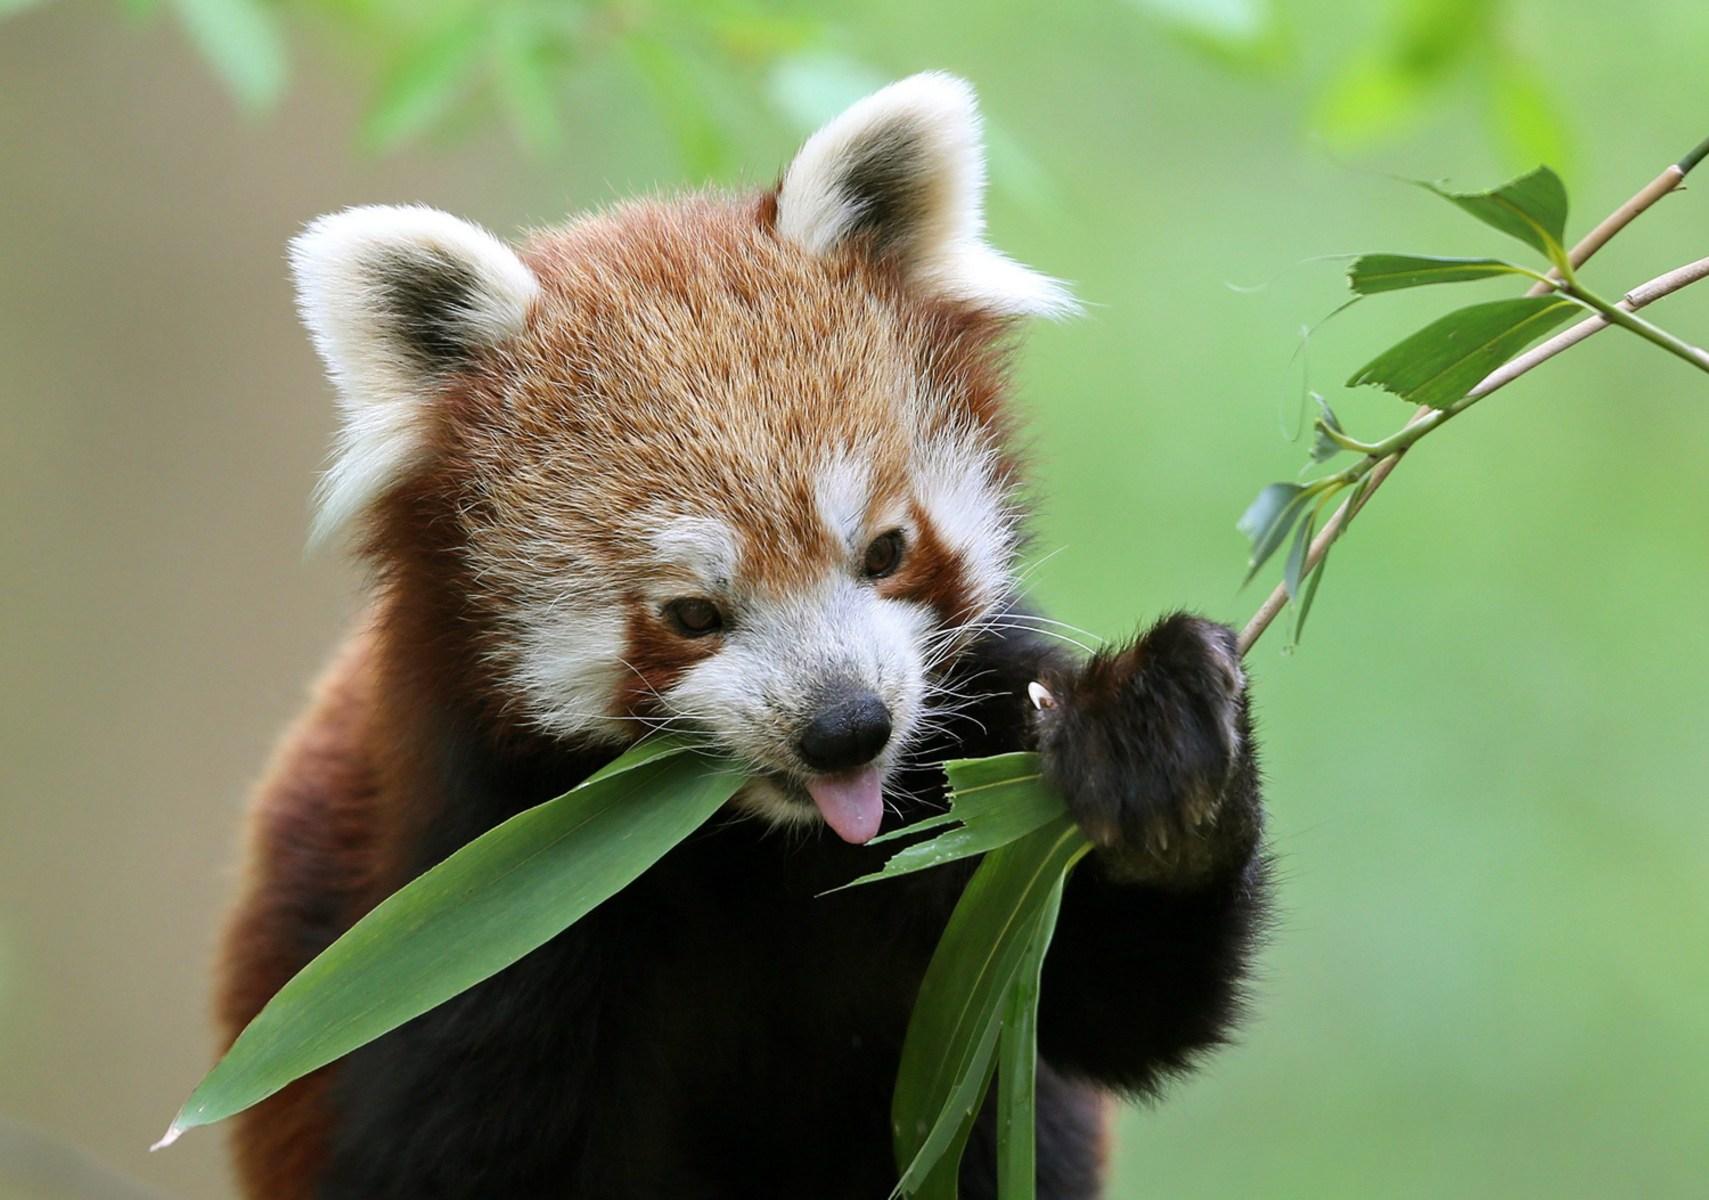 Cat Eats Bamboo